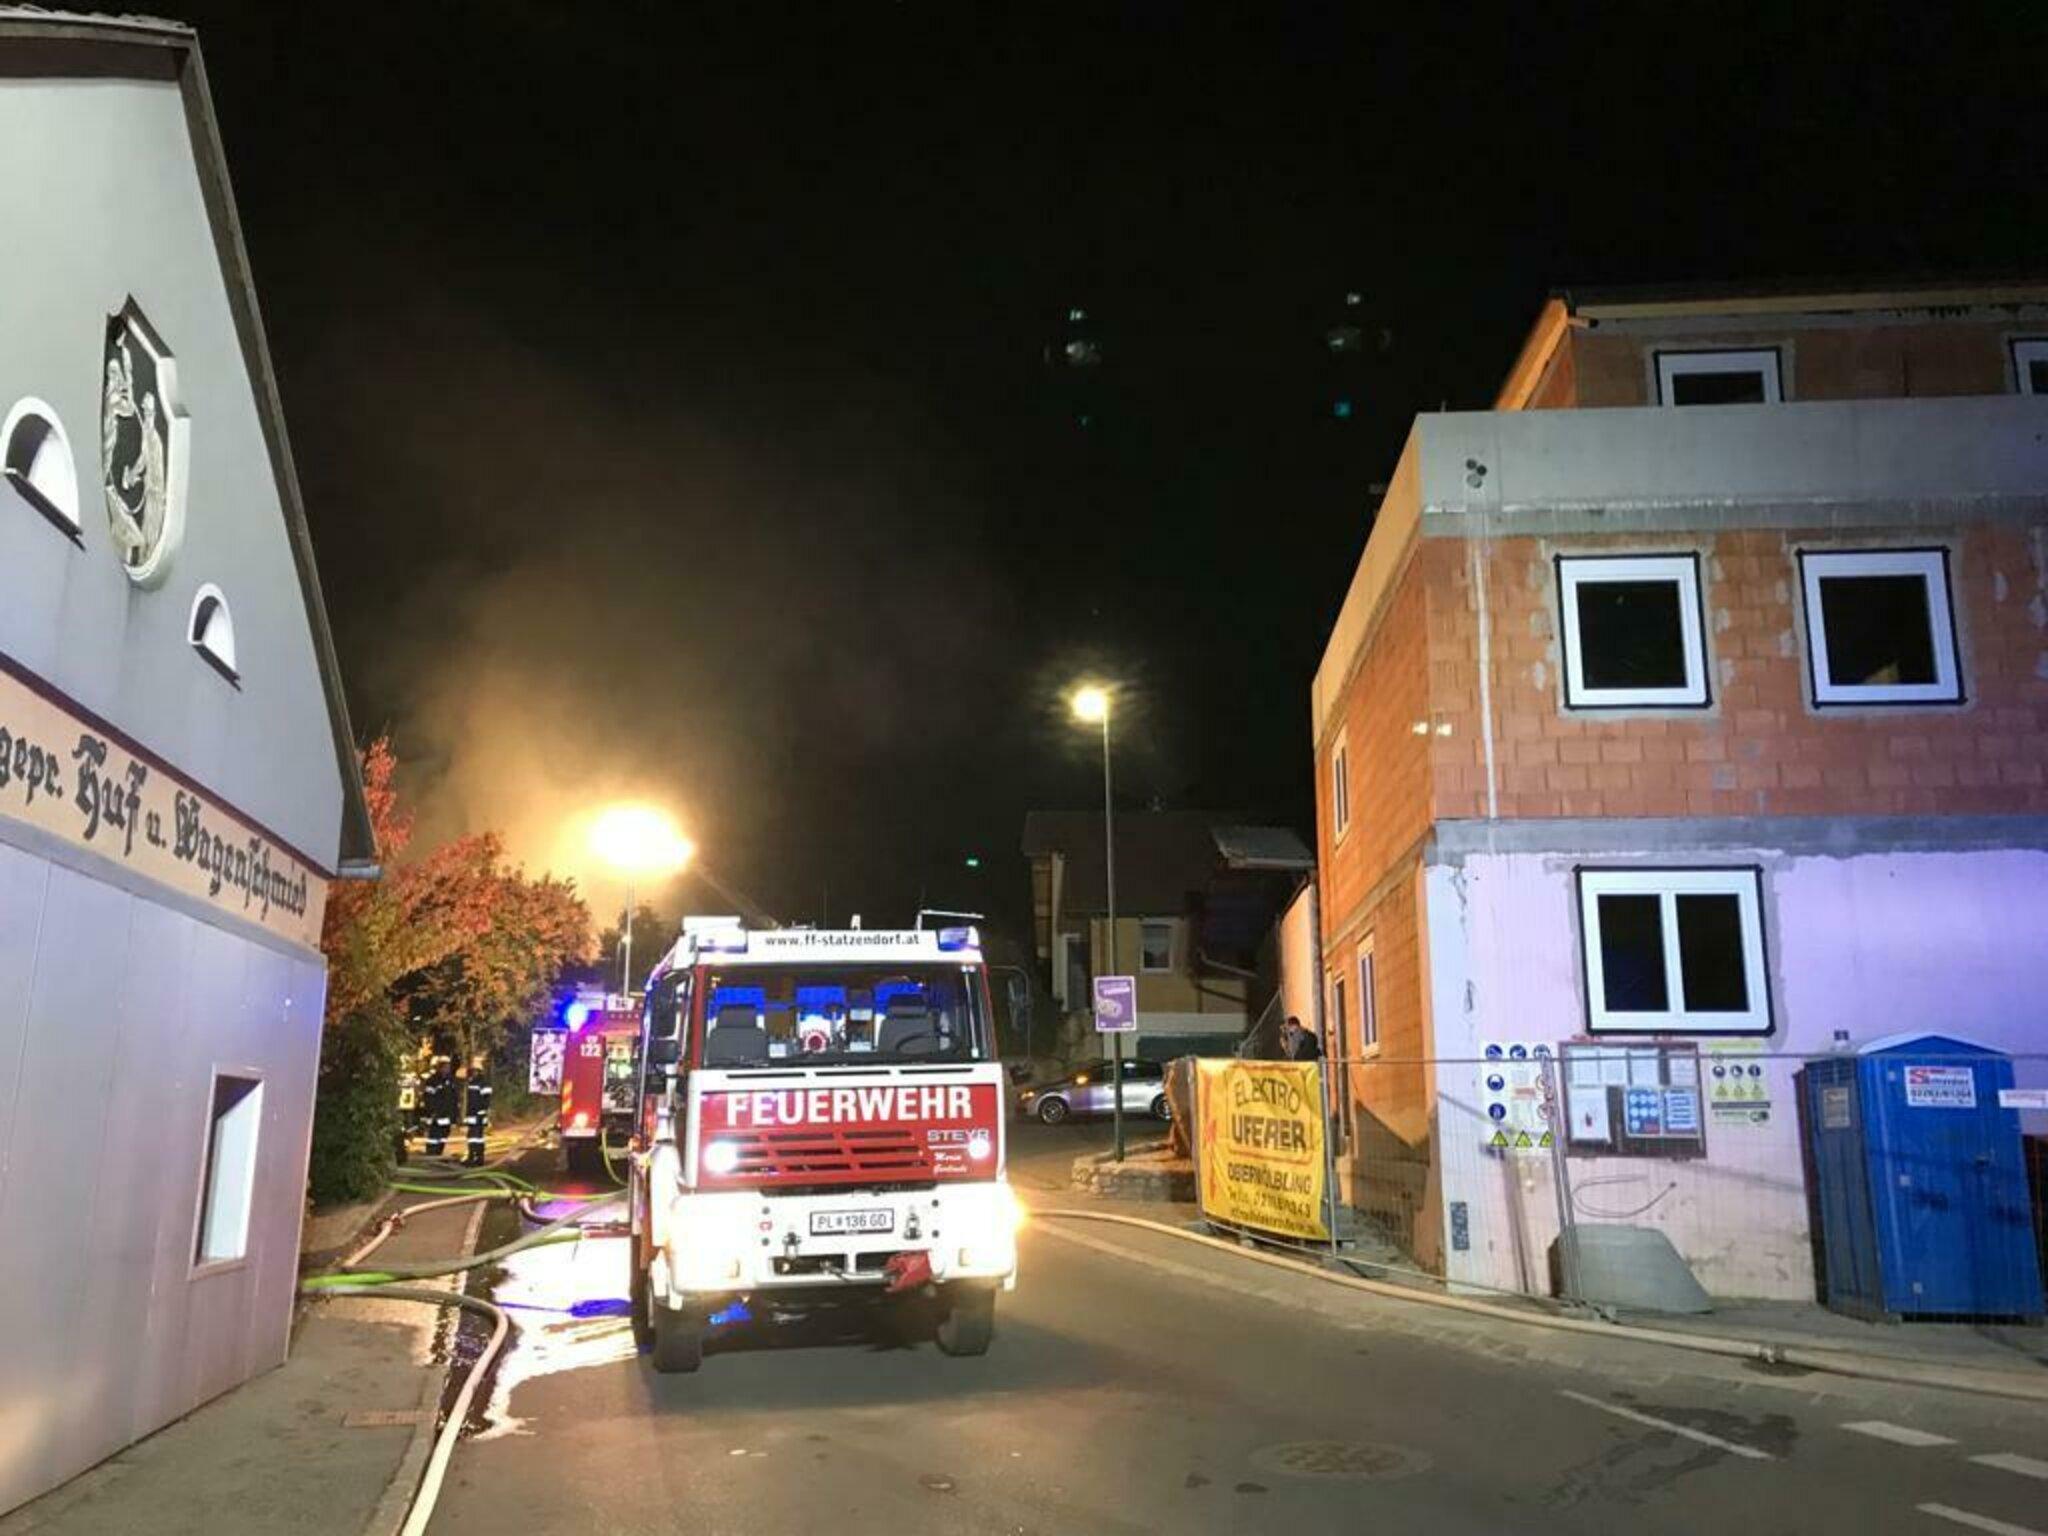 b3-wohnhausbrand-in-oberw-lbling